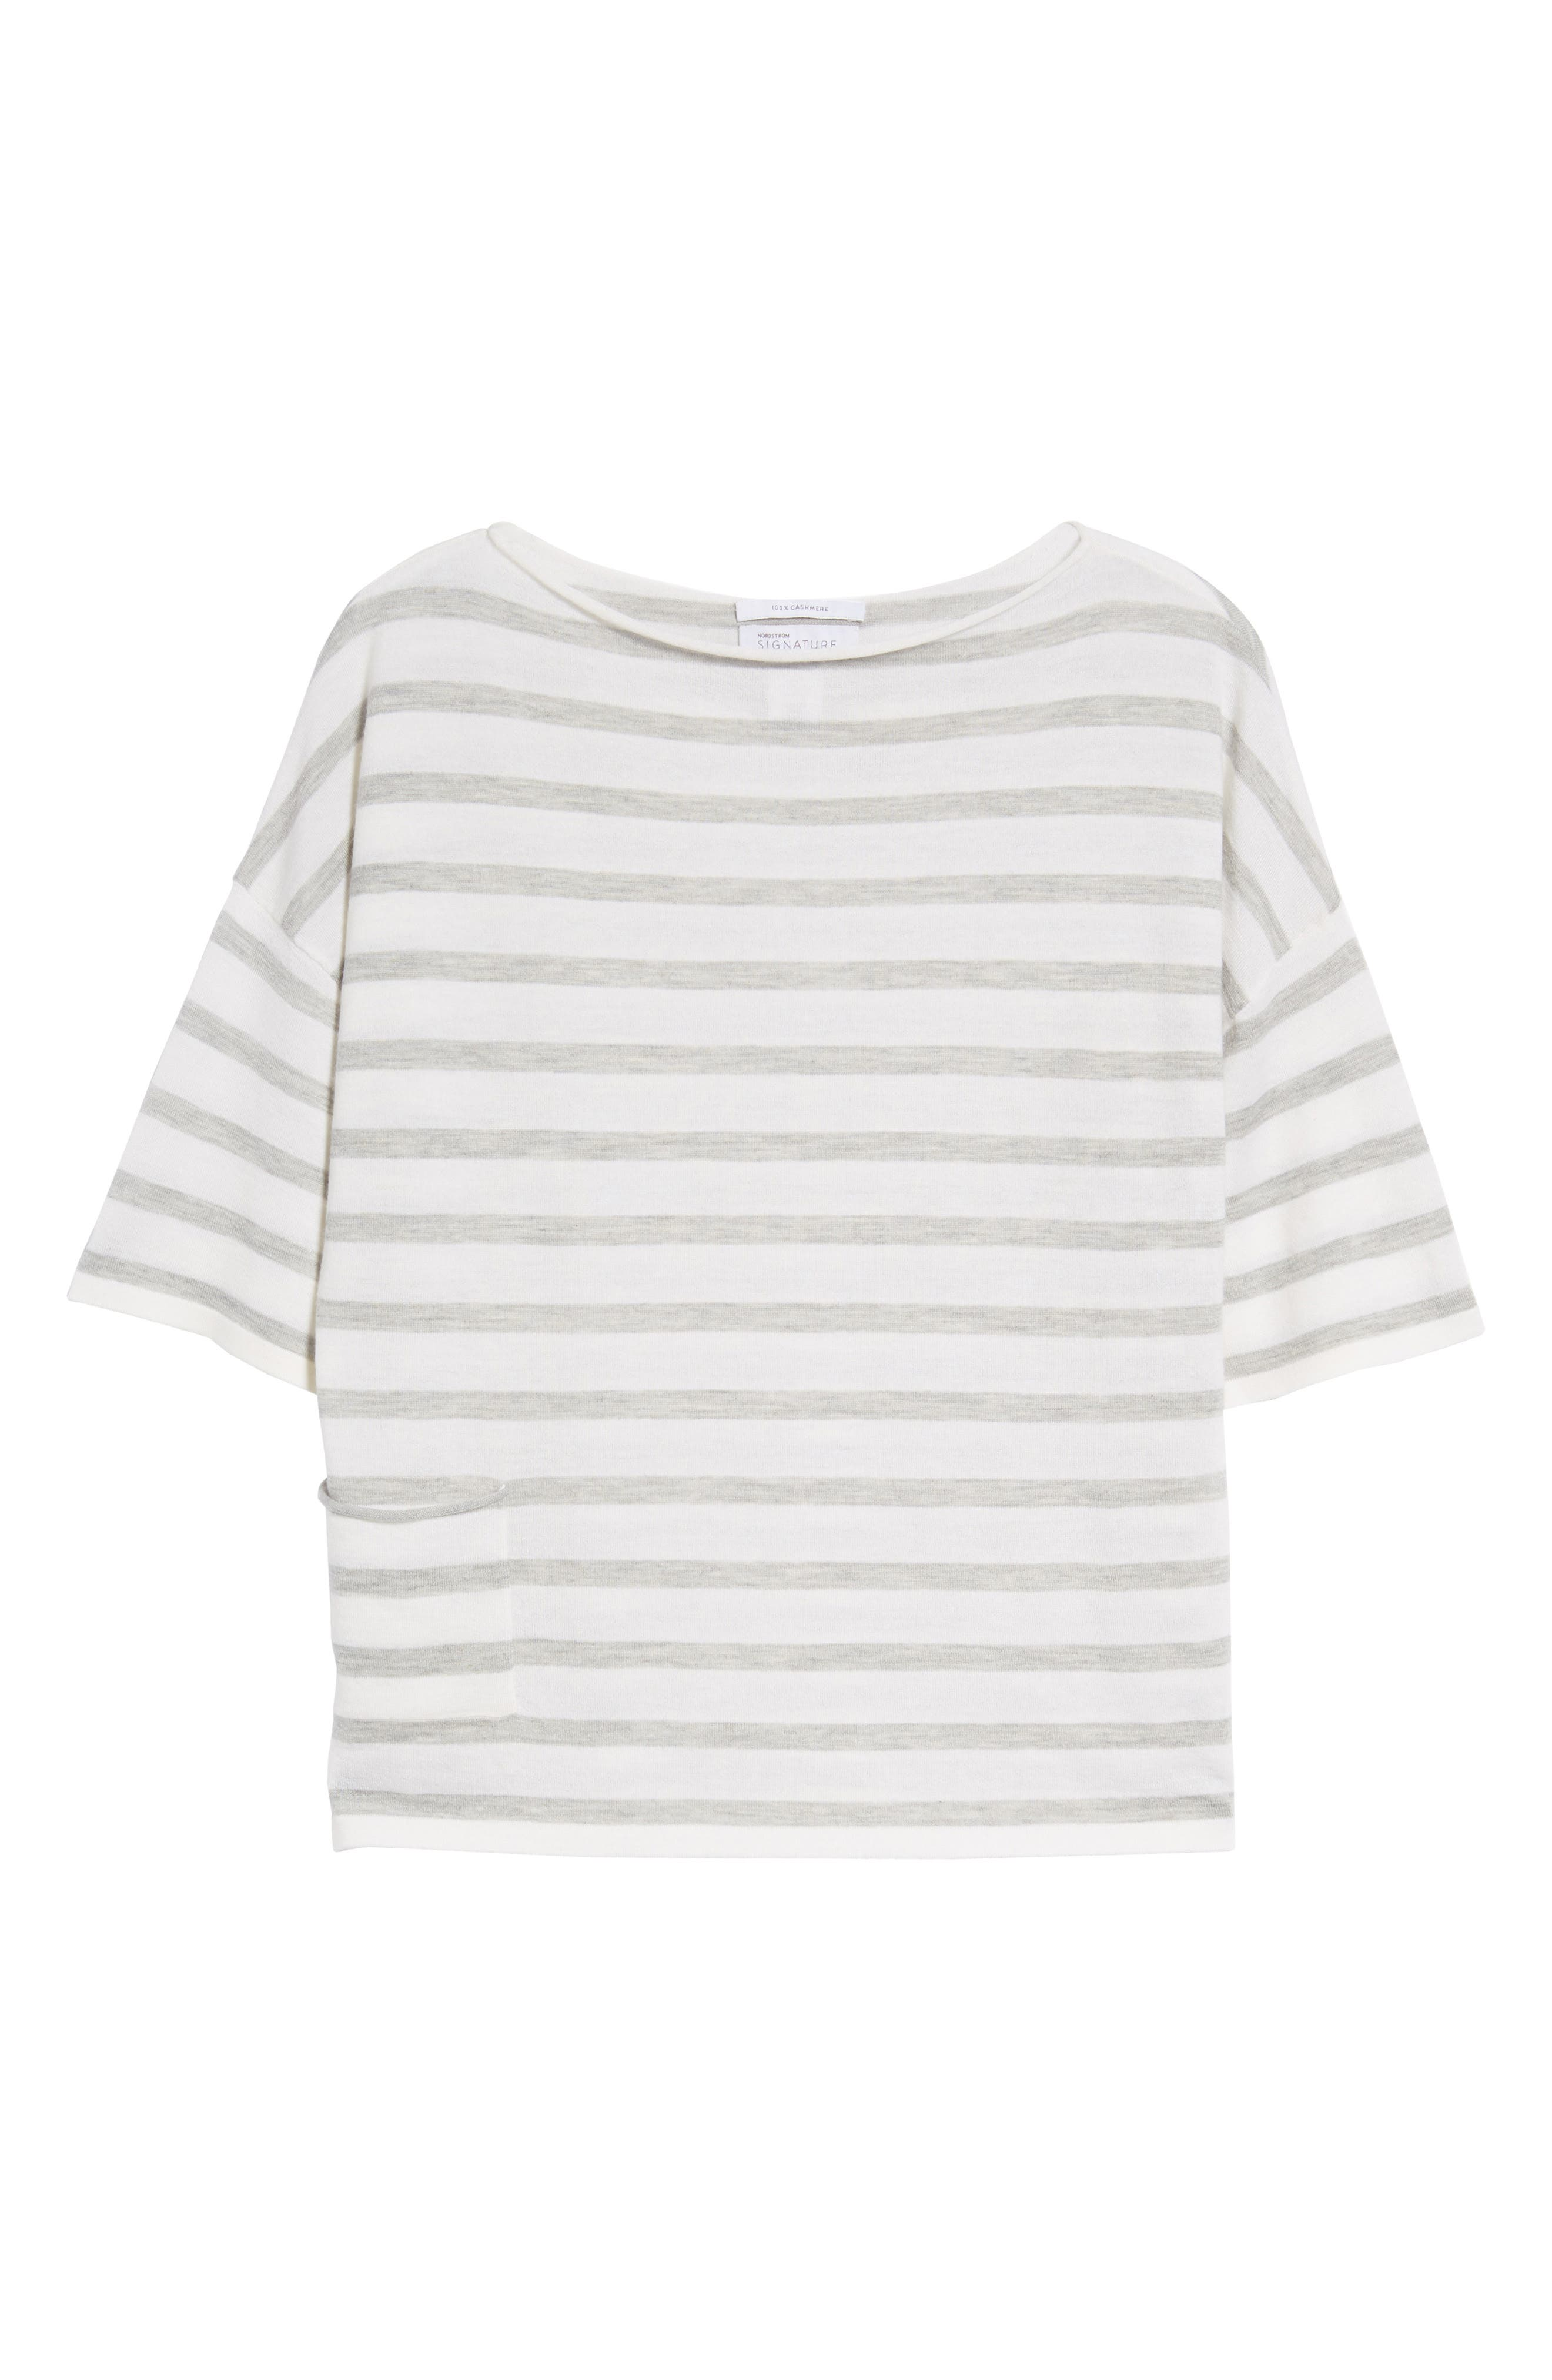 Stripe Cashmere Sweater,                             Alternate thumbnail 7, color,                             Ivory- Grey Heather Stripe